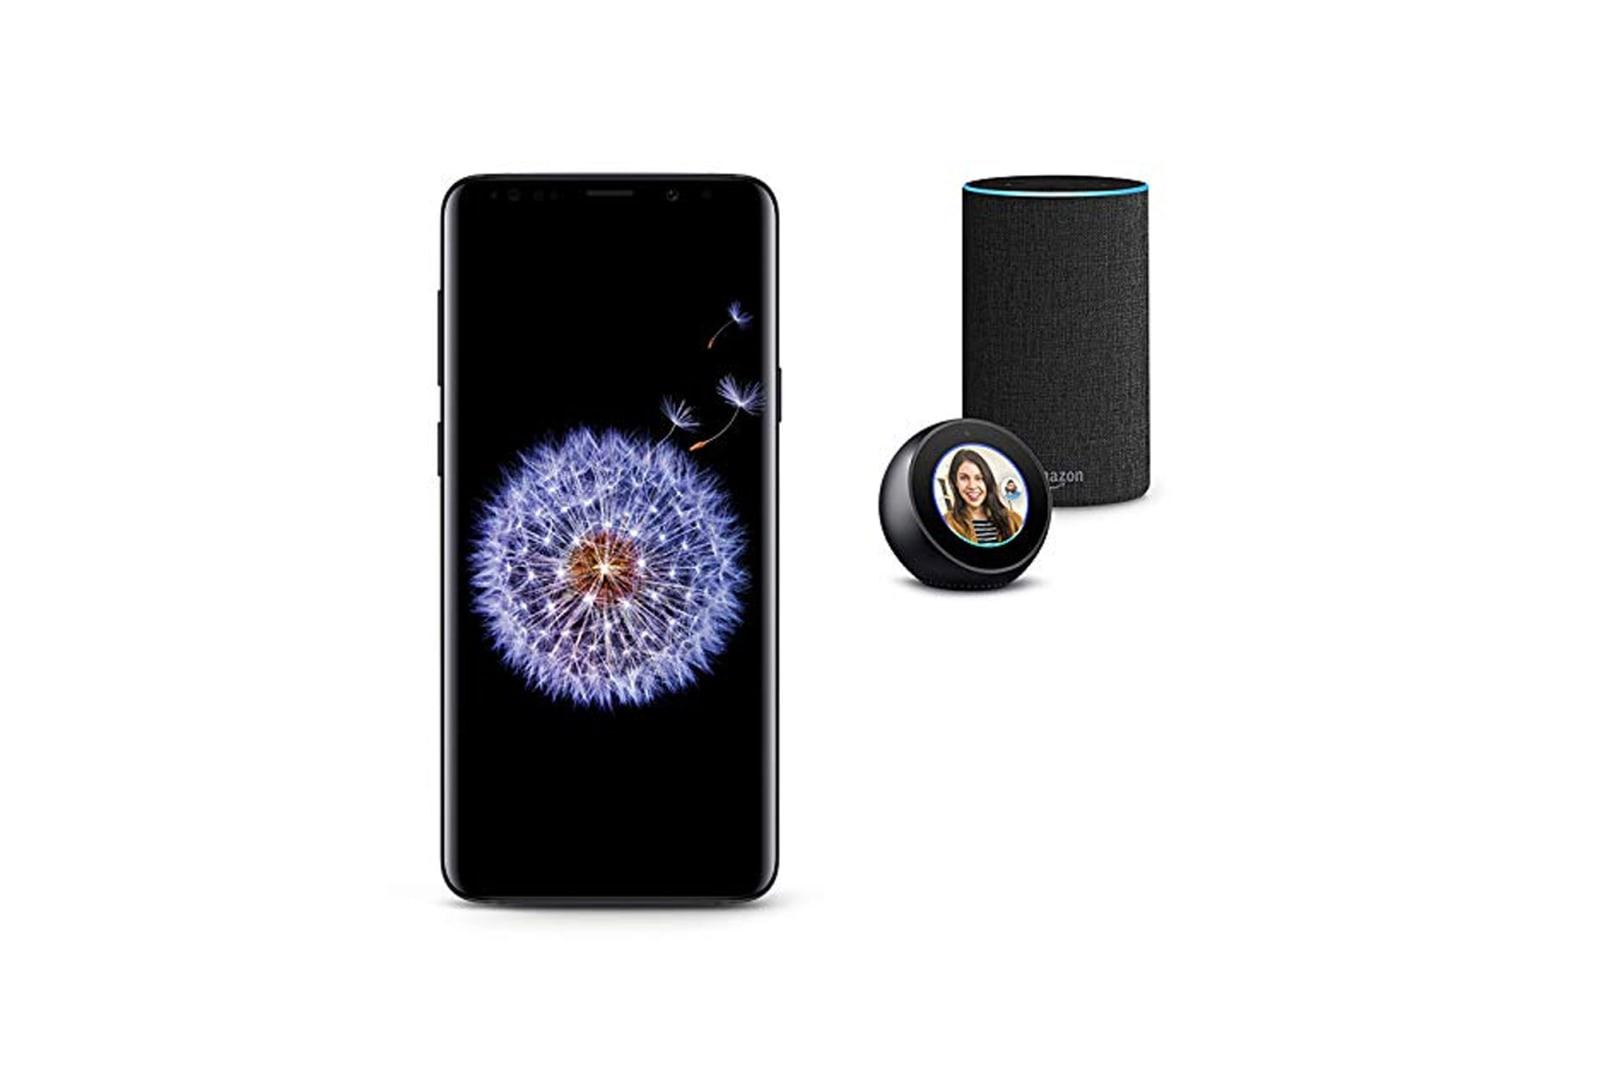 Samsung Galaxy S9, Echo Spot, and Echo Bundle